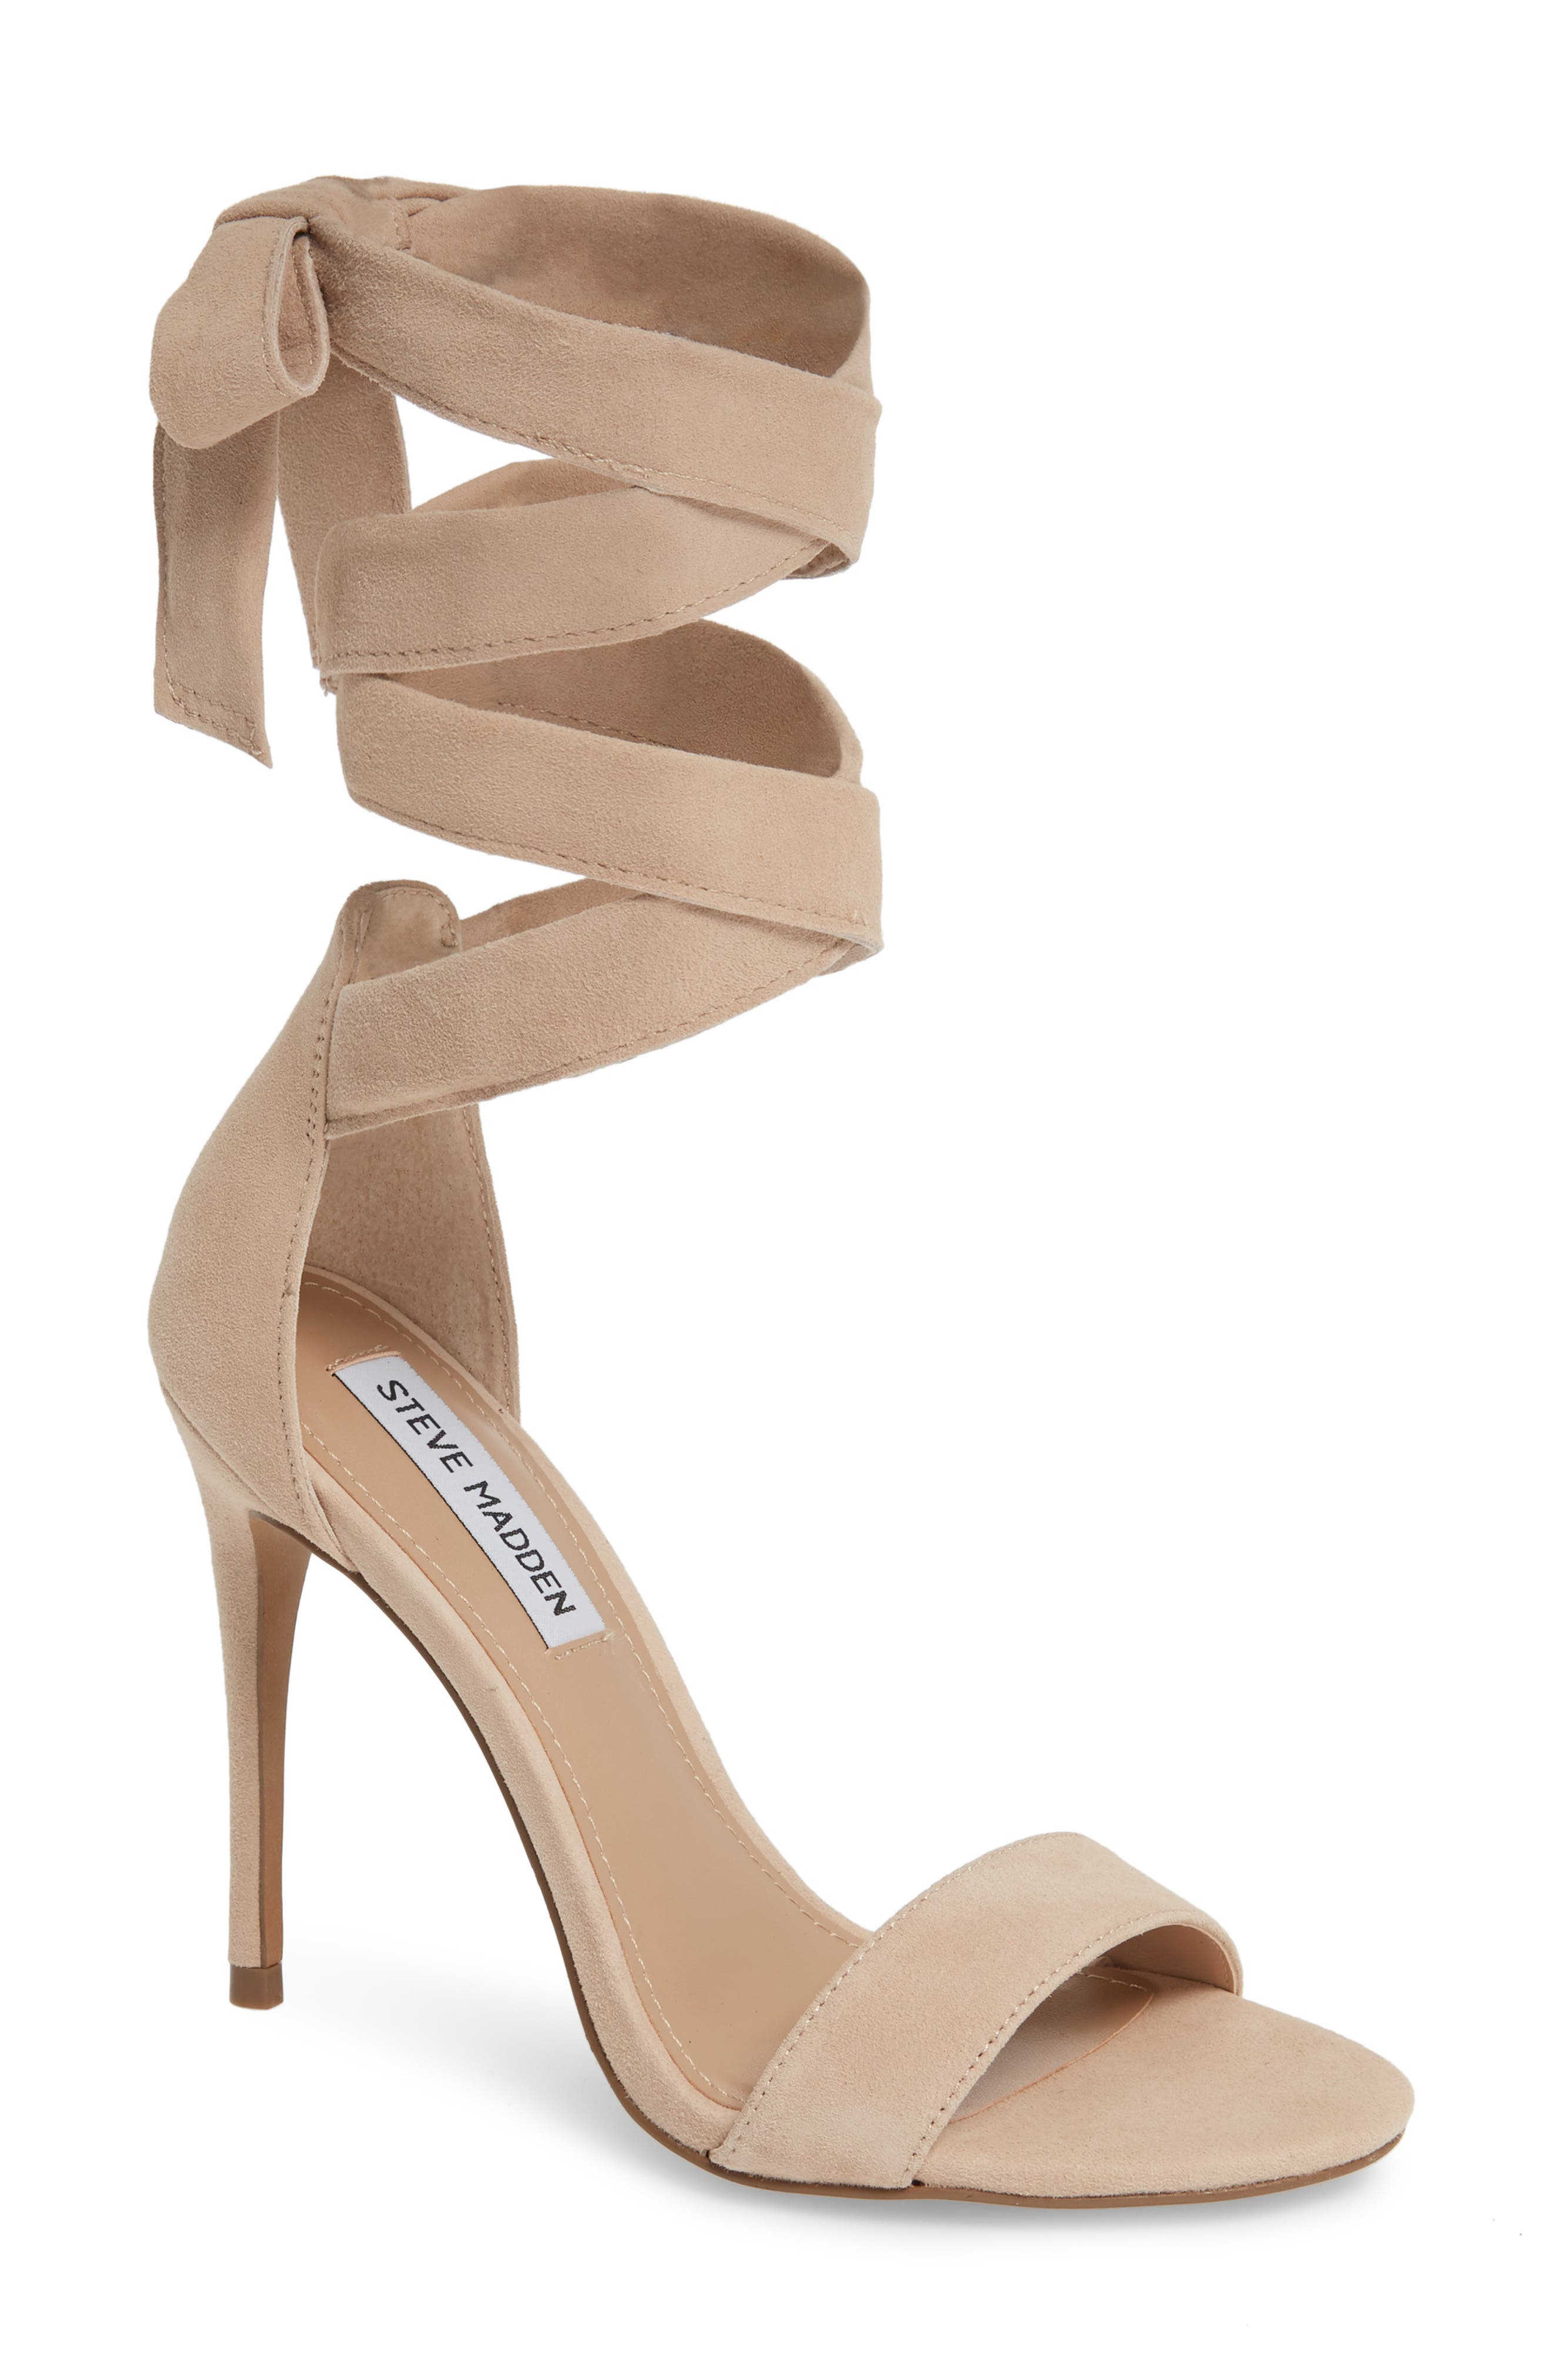 STEVE MADDEN Entertainment Wraparound Sandal, Main, color, BLUSH SUEDE